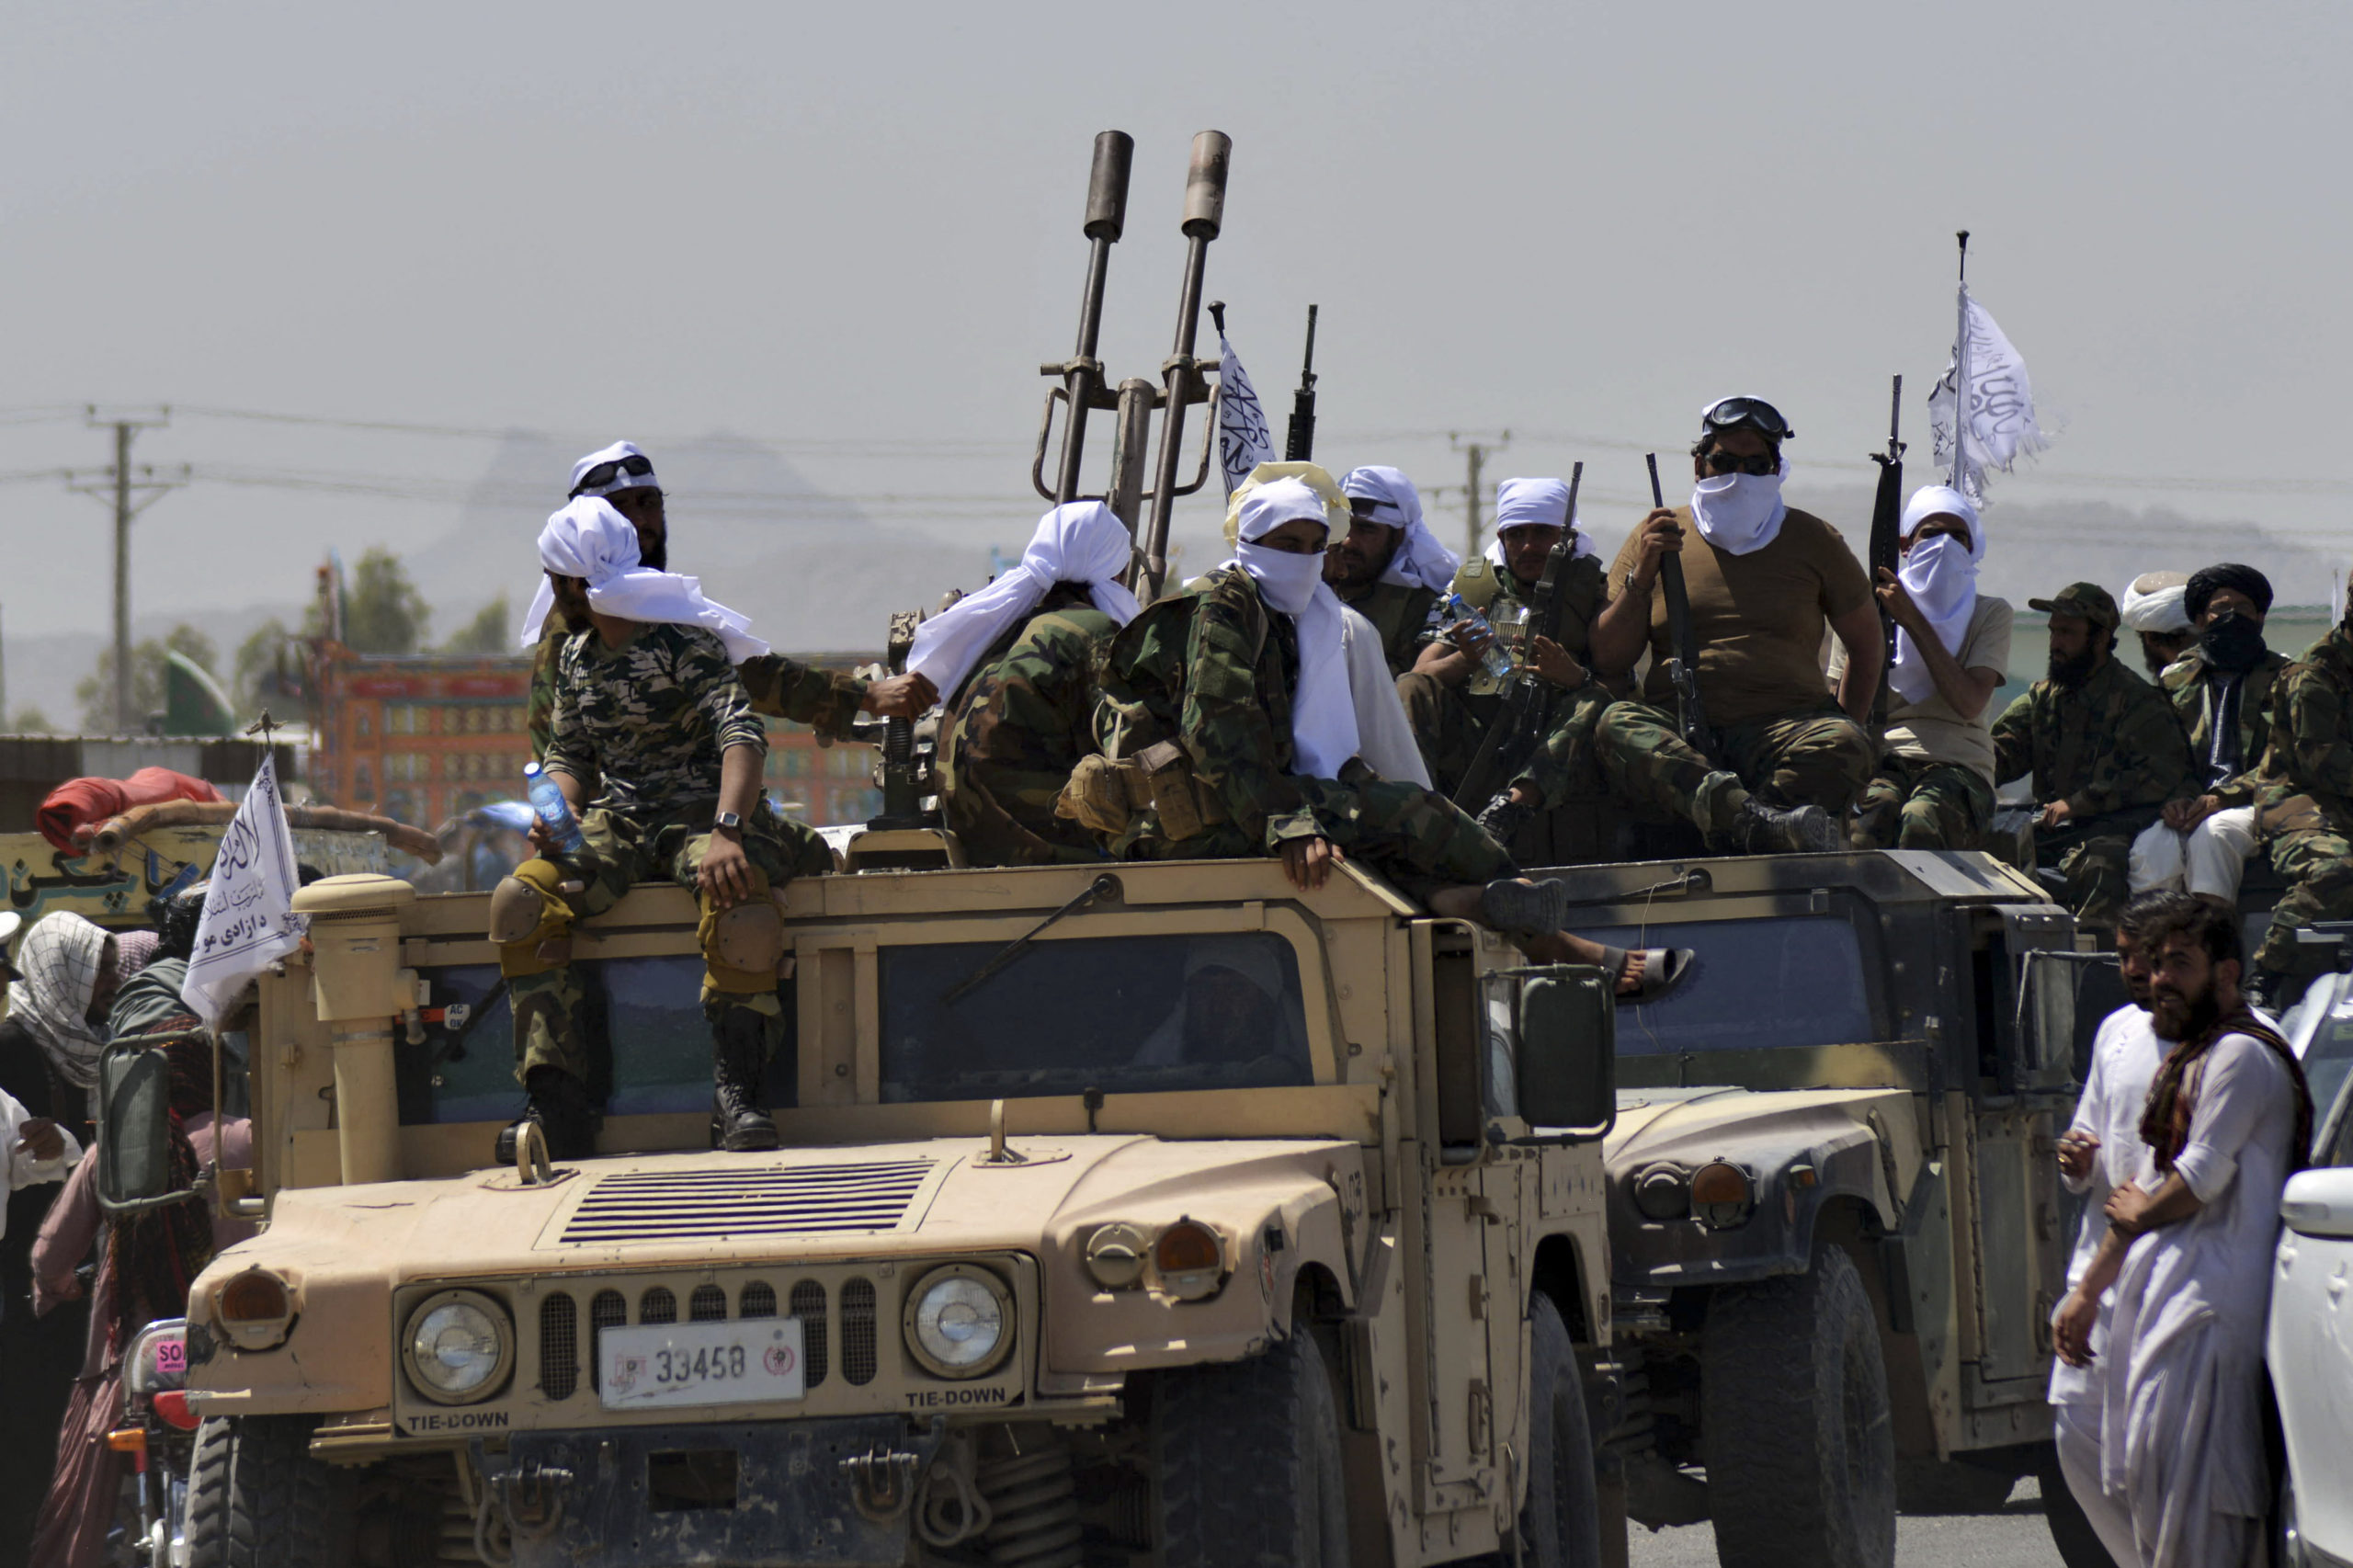 Taliban fighters ride U.S. Humvee vehicles during a parade in Kandahar, Afghanistan on Sept. 1. (Javed Tanveer/AFP via Getty Images)